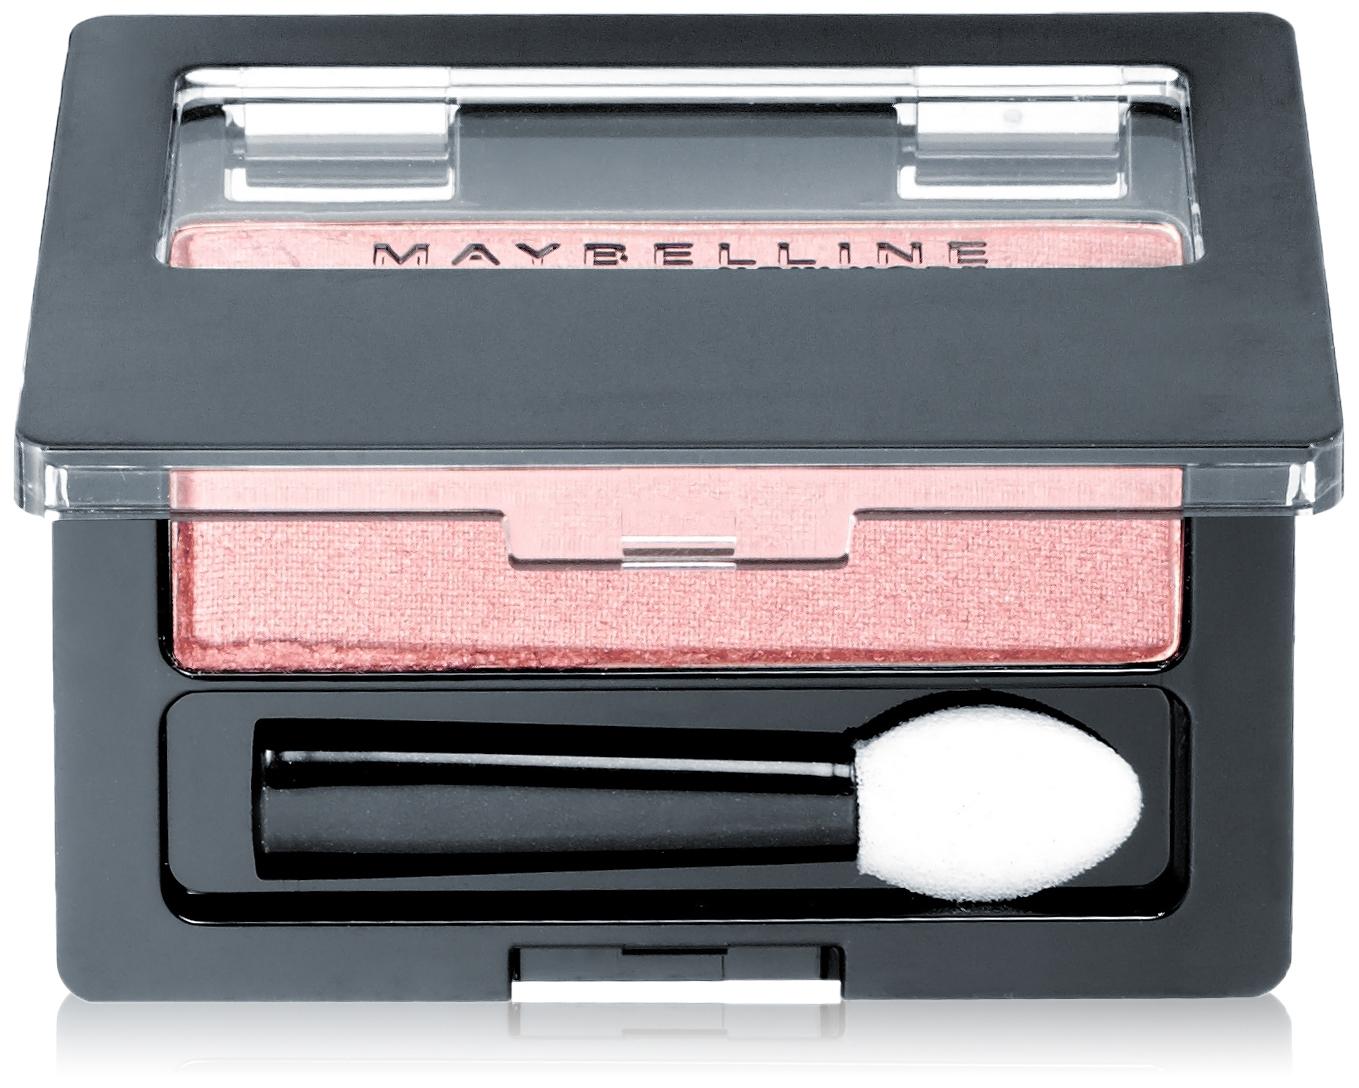 Maybelline New York Expert Wear Eyeshadow, Seashell, Singles, 0.09 Ounce